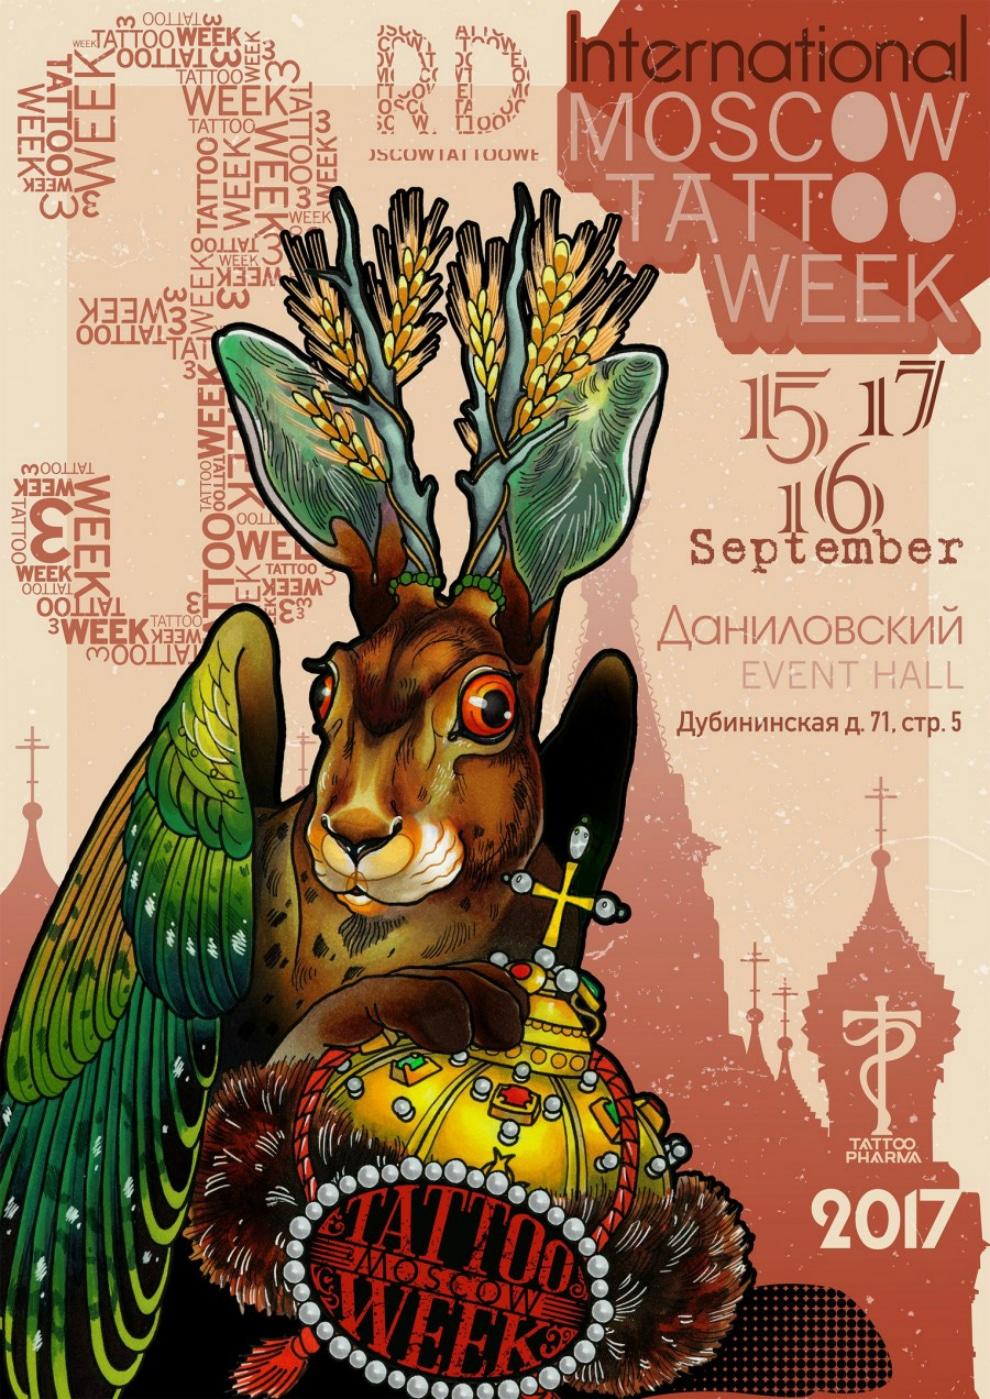 International Moscow Tattoo Week 2017